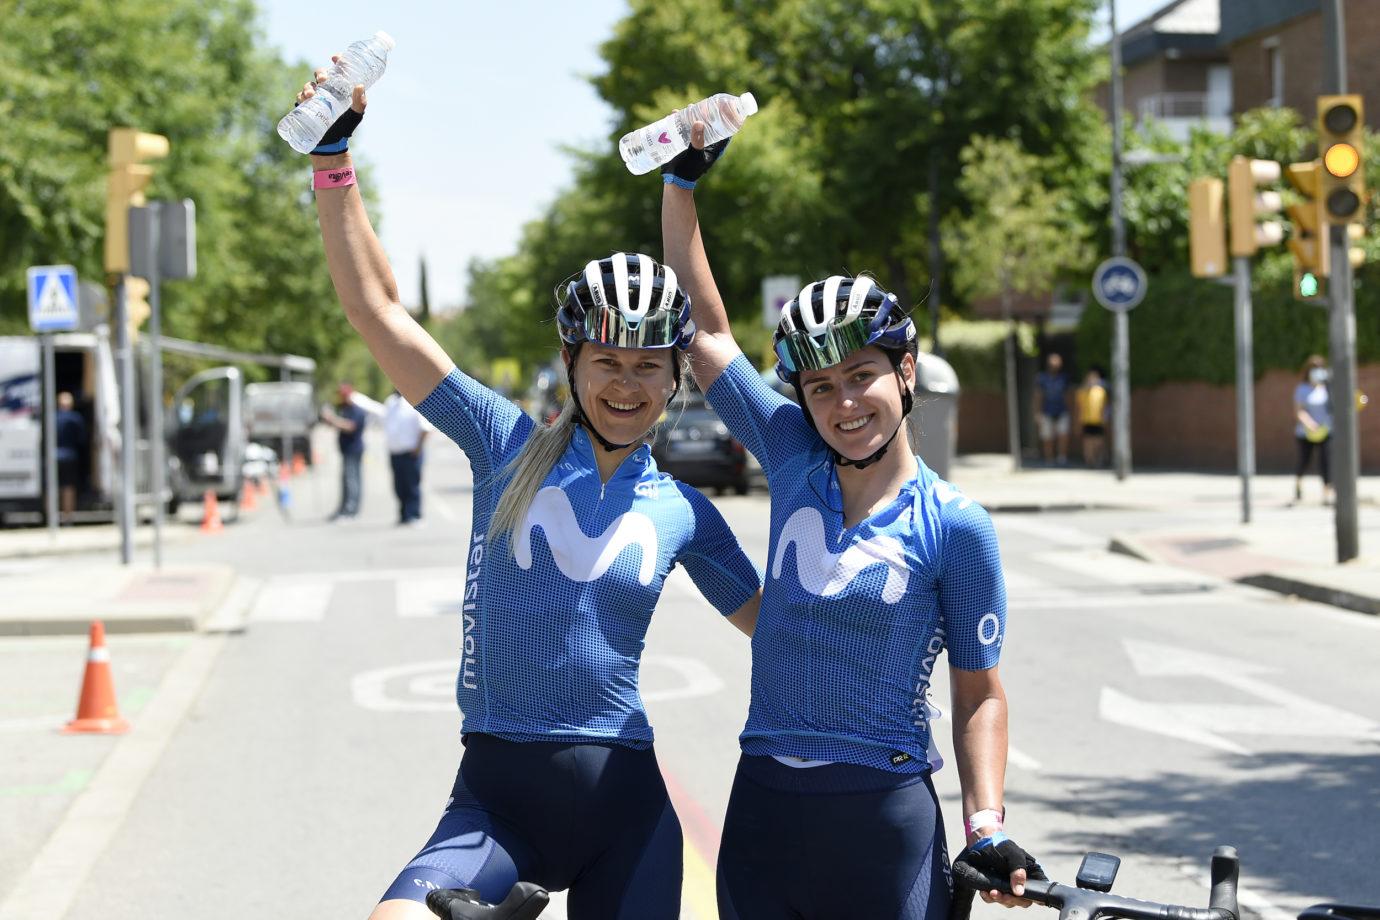 News' image'Katrine Aalerud gana la reVolta, prueba femenina de la Volta a Catalunya'